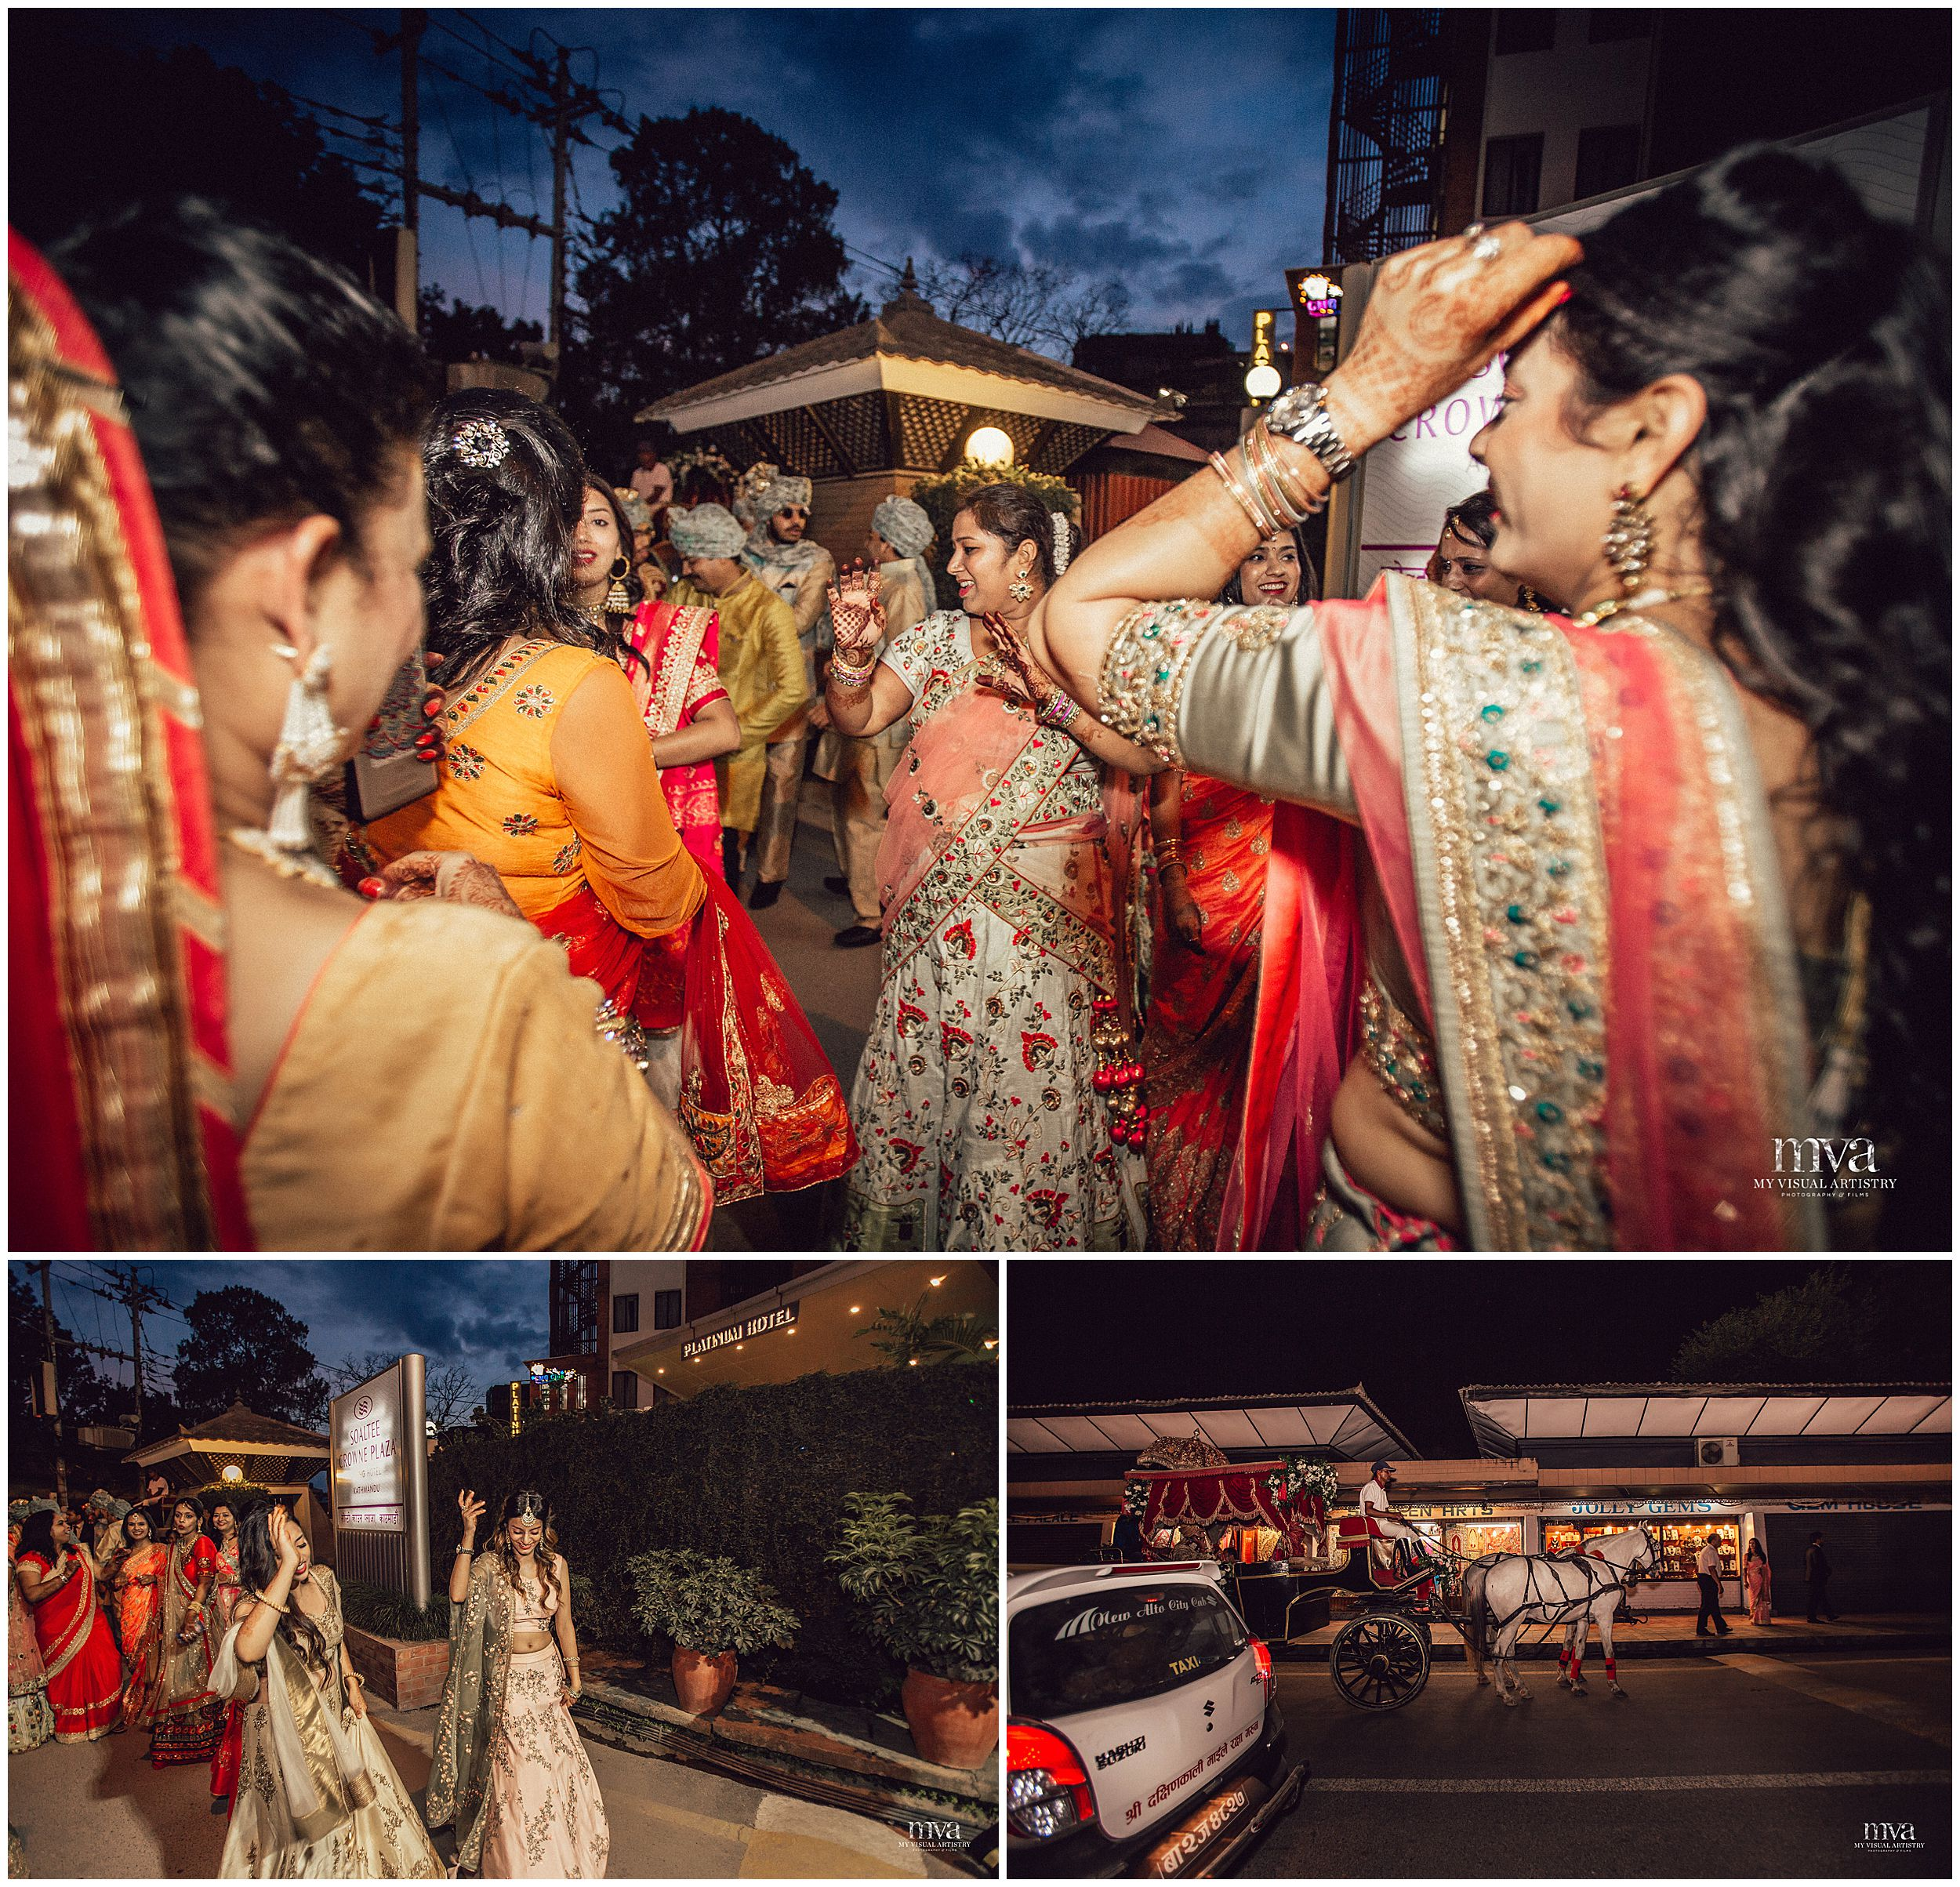 SONAAL_AMI_MYVISUALARTISTRY_WEDDING_PHOTOGRAPHY_MVA_NEPAL_KATHMANDU_SOALTEE37.jpg